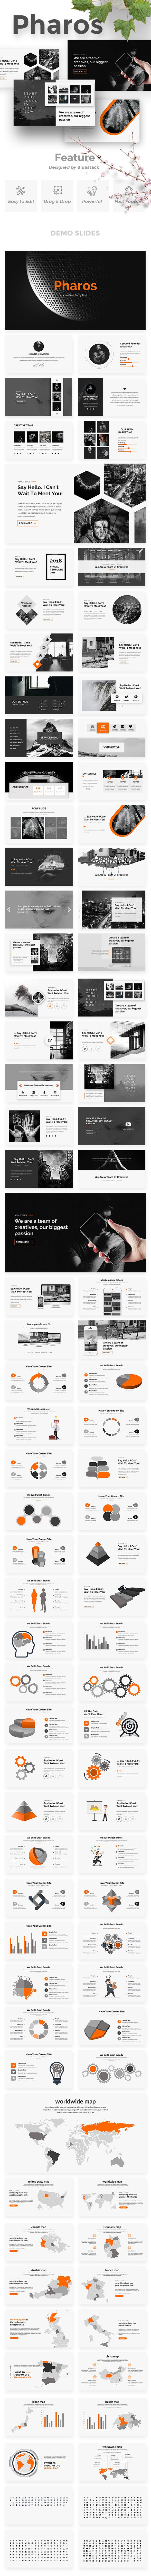 Pharos Creative Powerpoint Template - Creative PowerPoint Templates